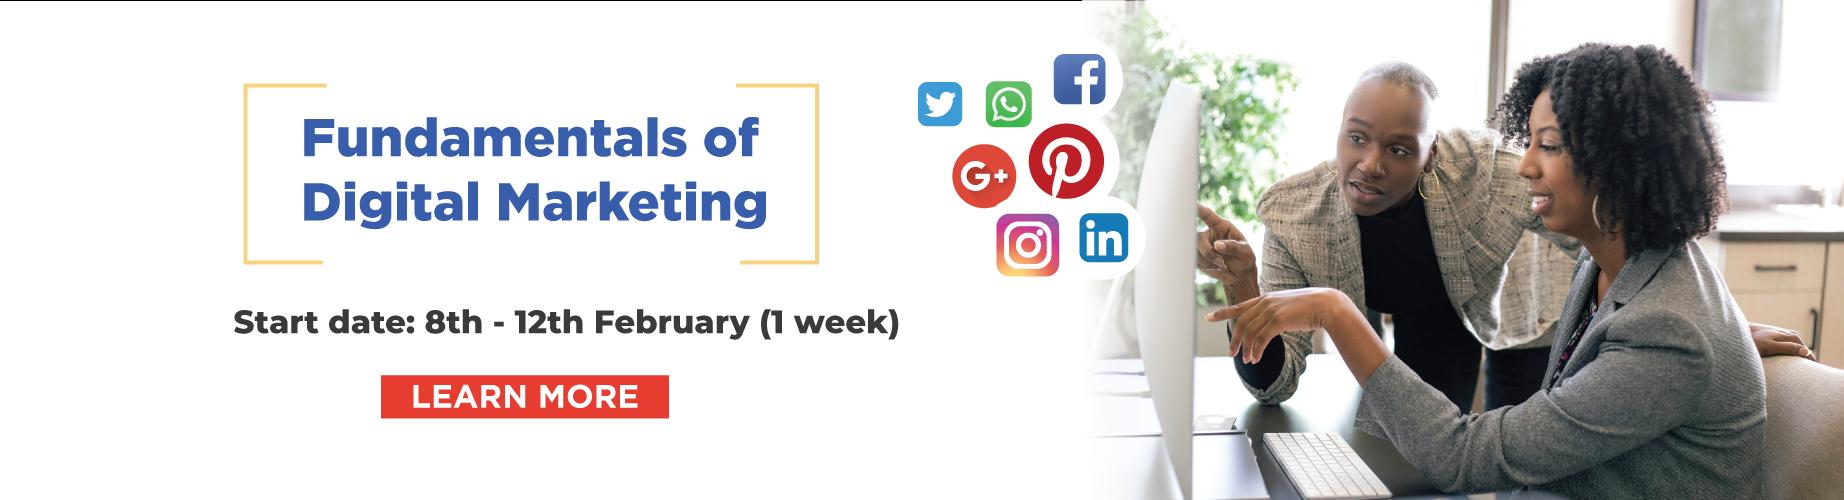 Web-banner-Digital-Marketng-@ilabAfrica-2021